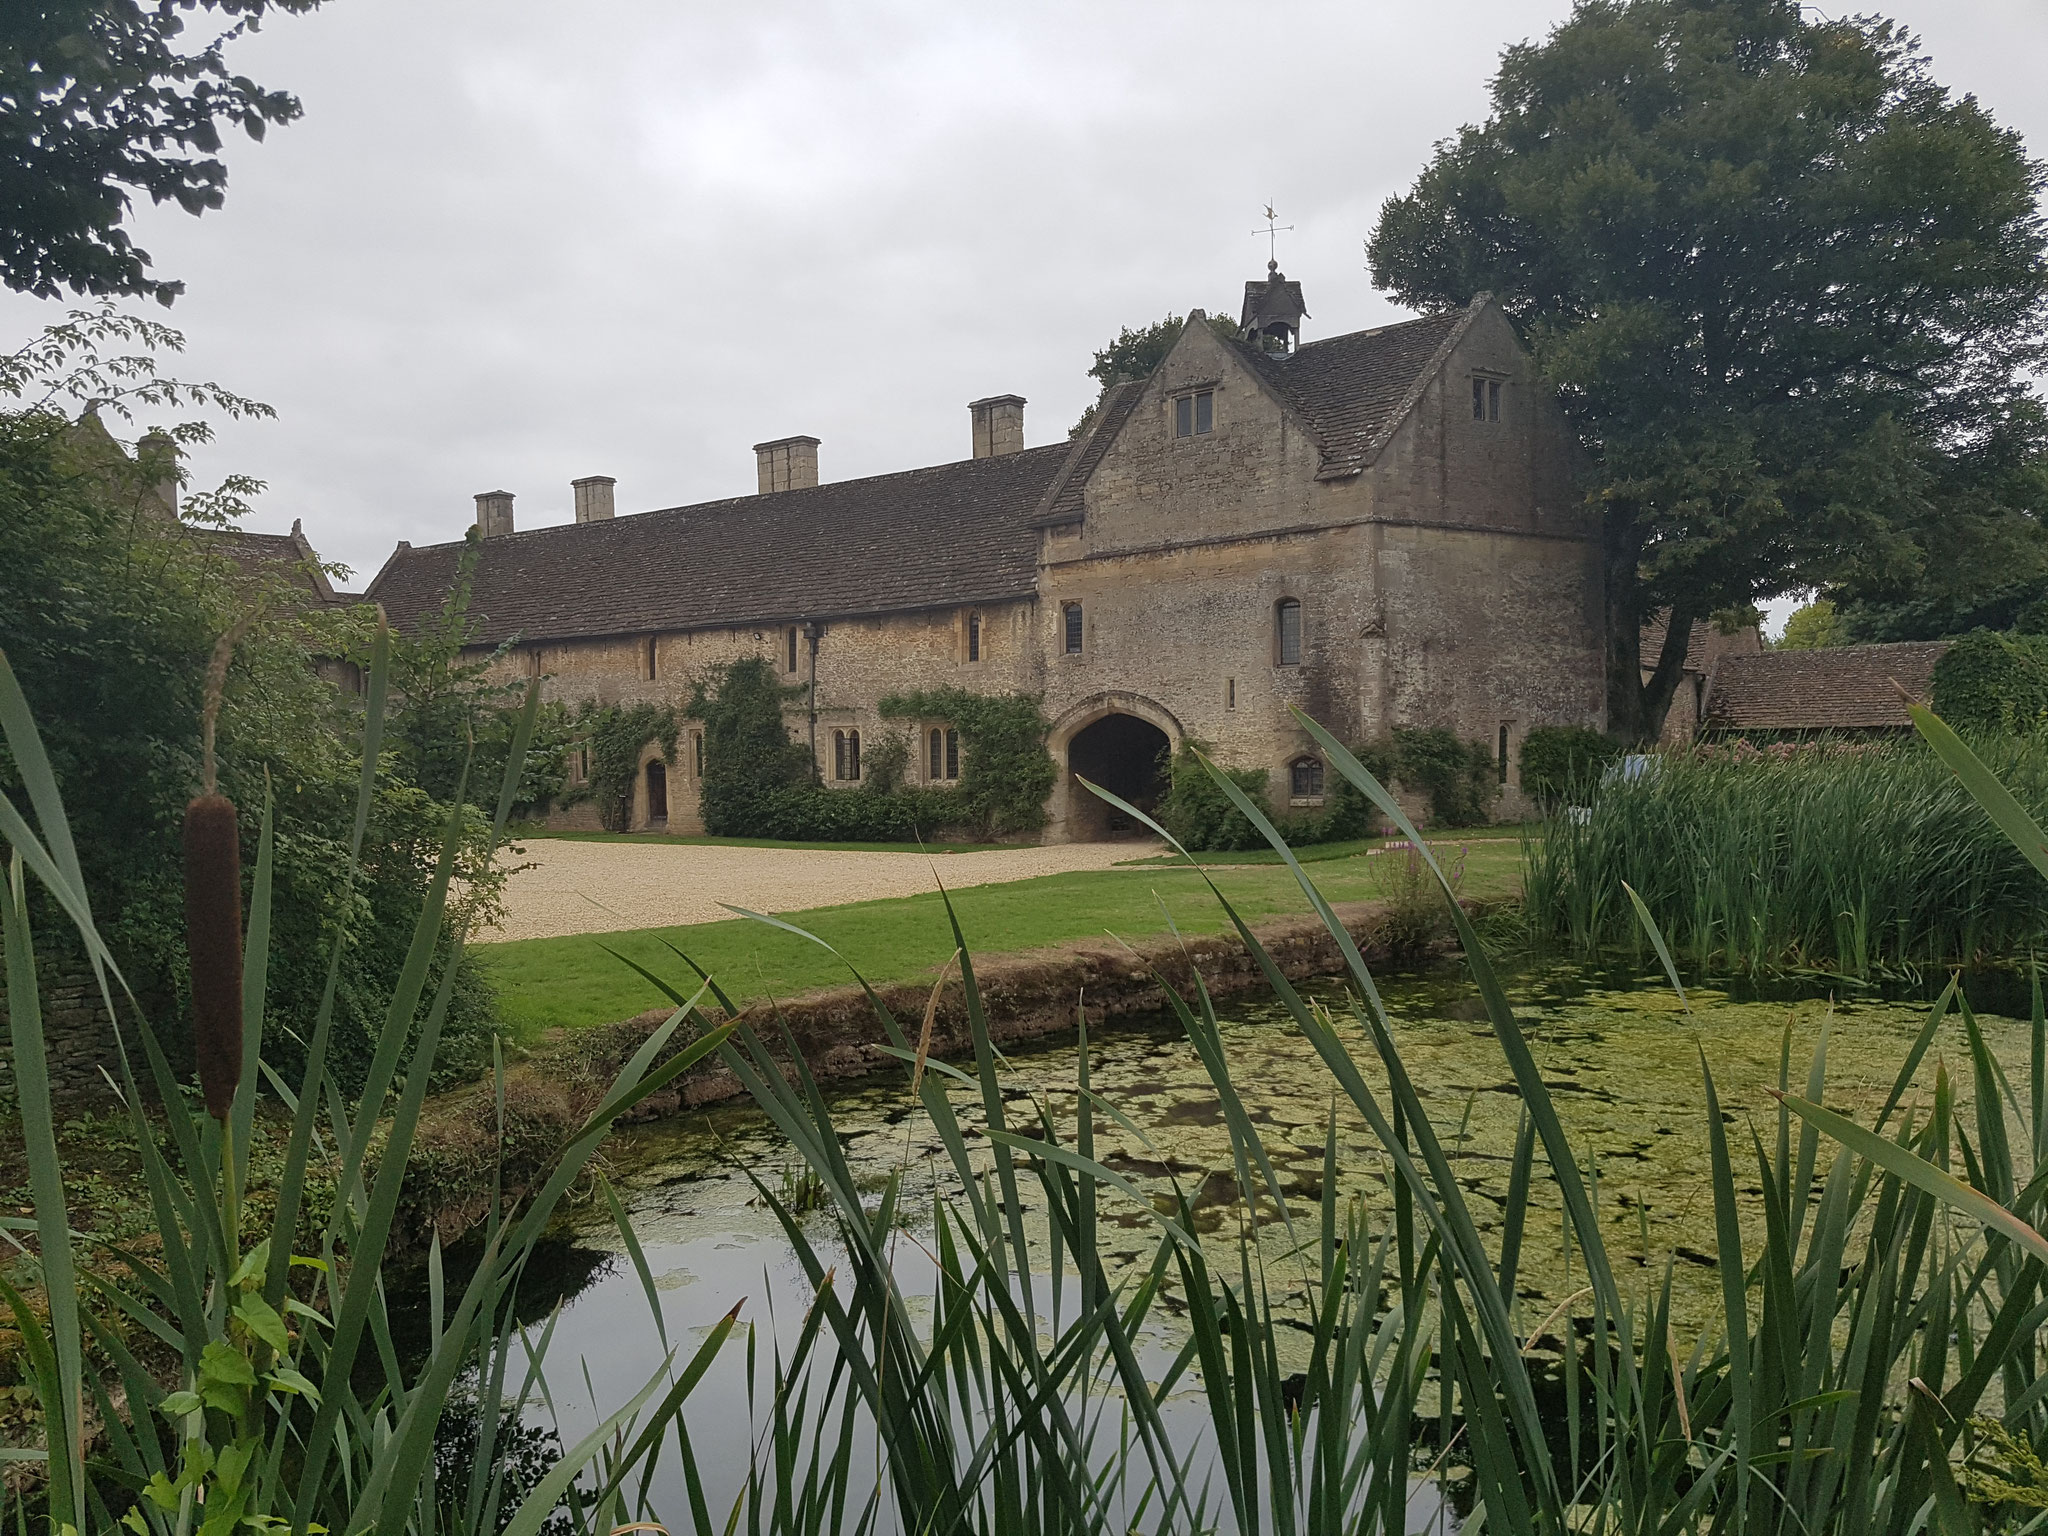 Manor House c.1450